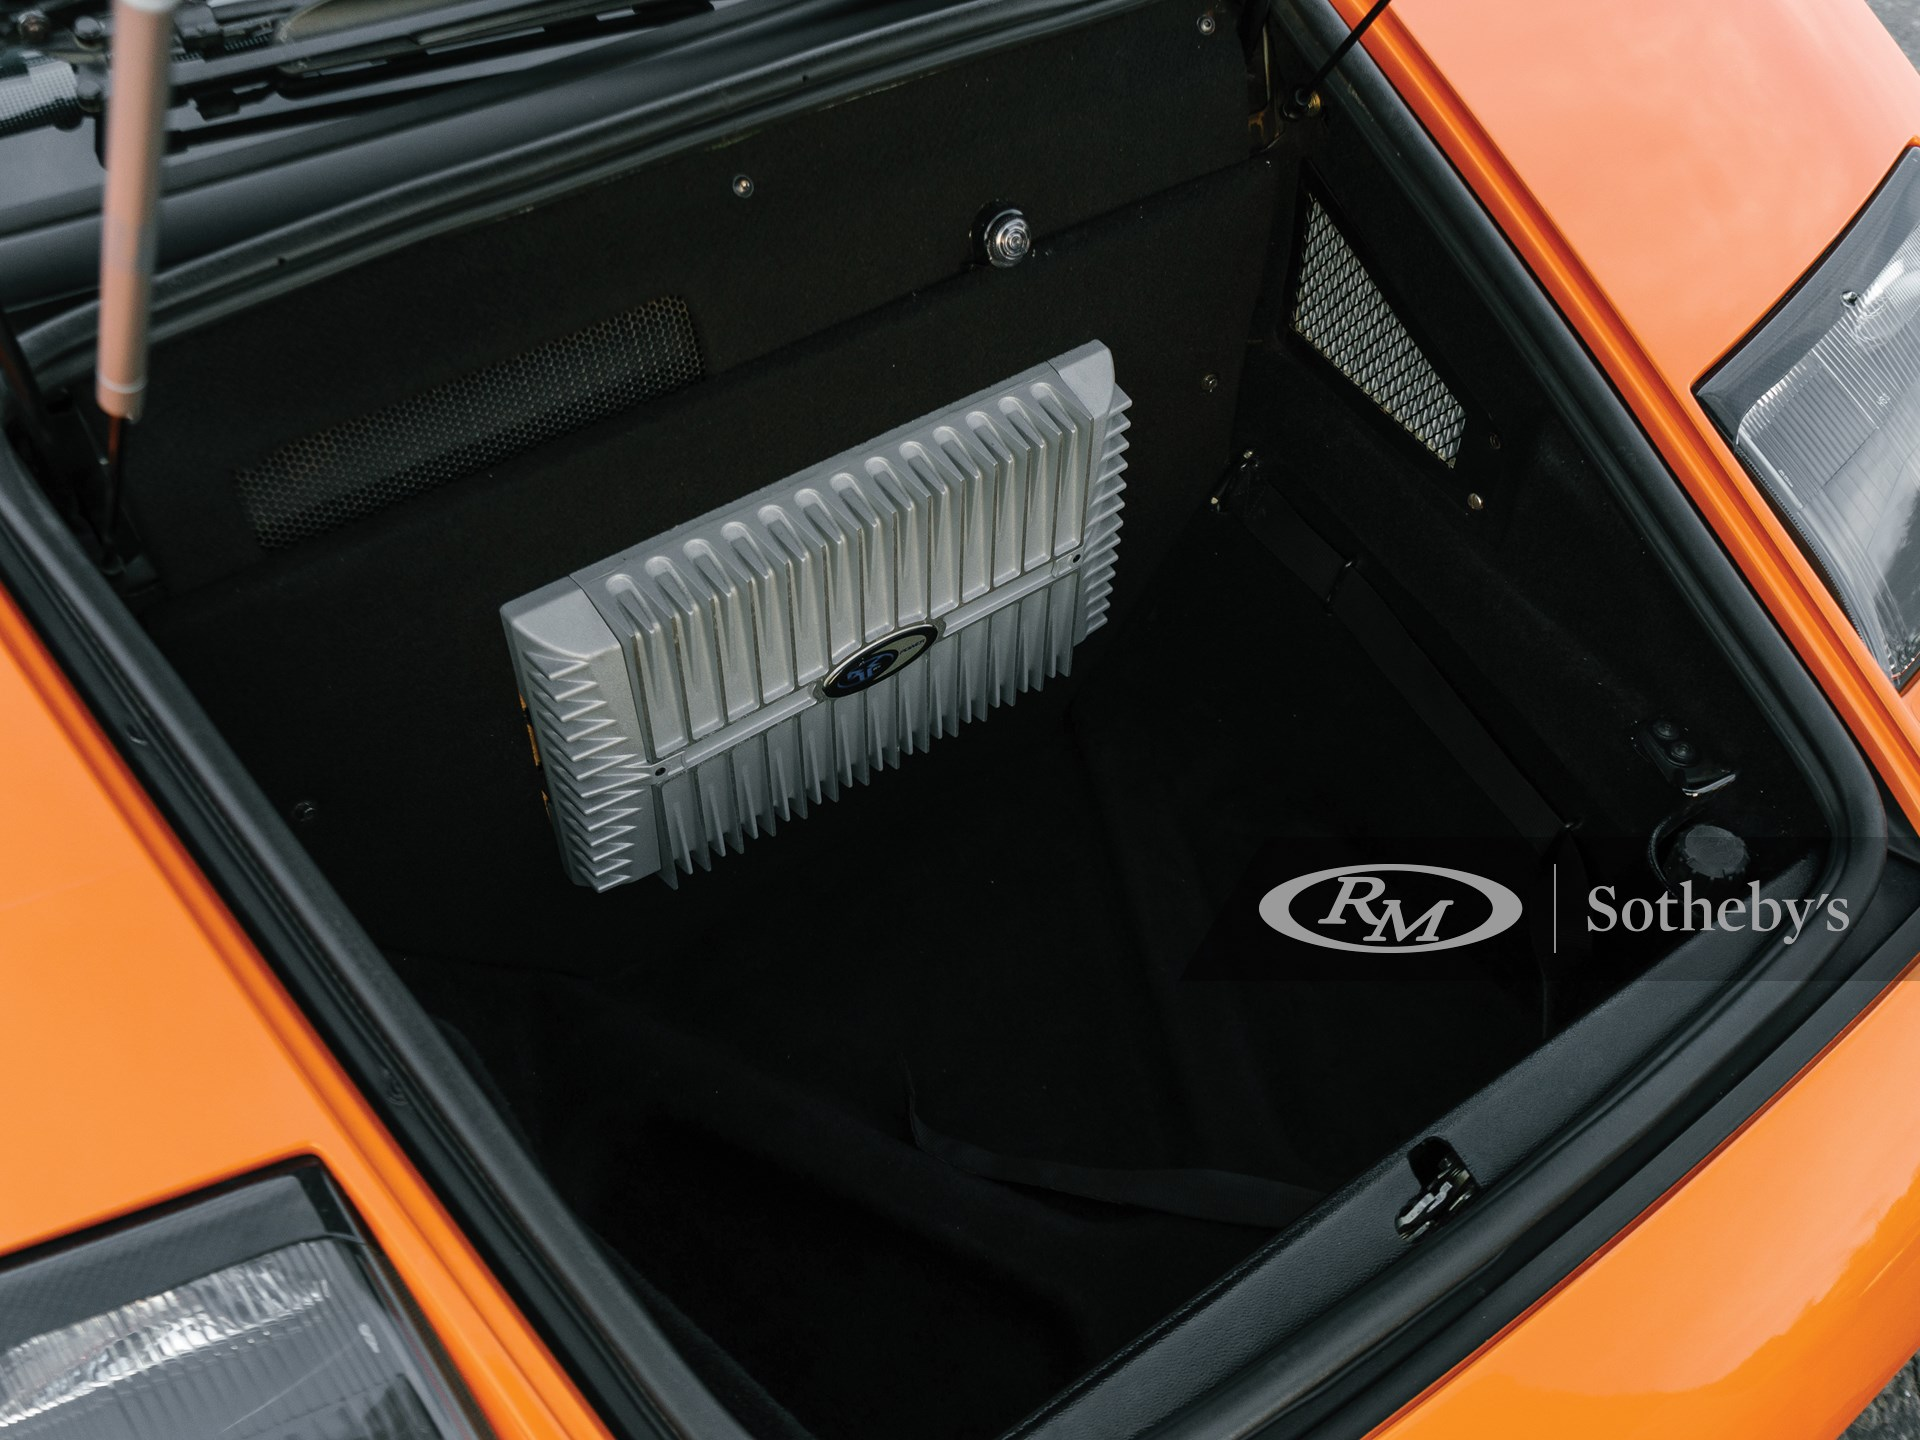 2001 Lamborghini Diablo VT 6.0  -